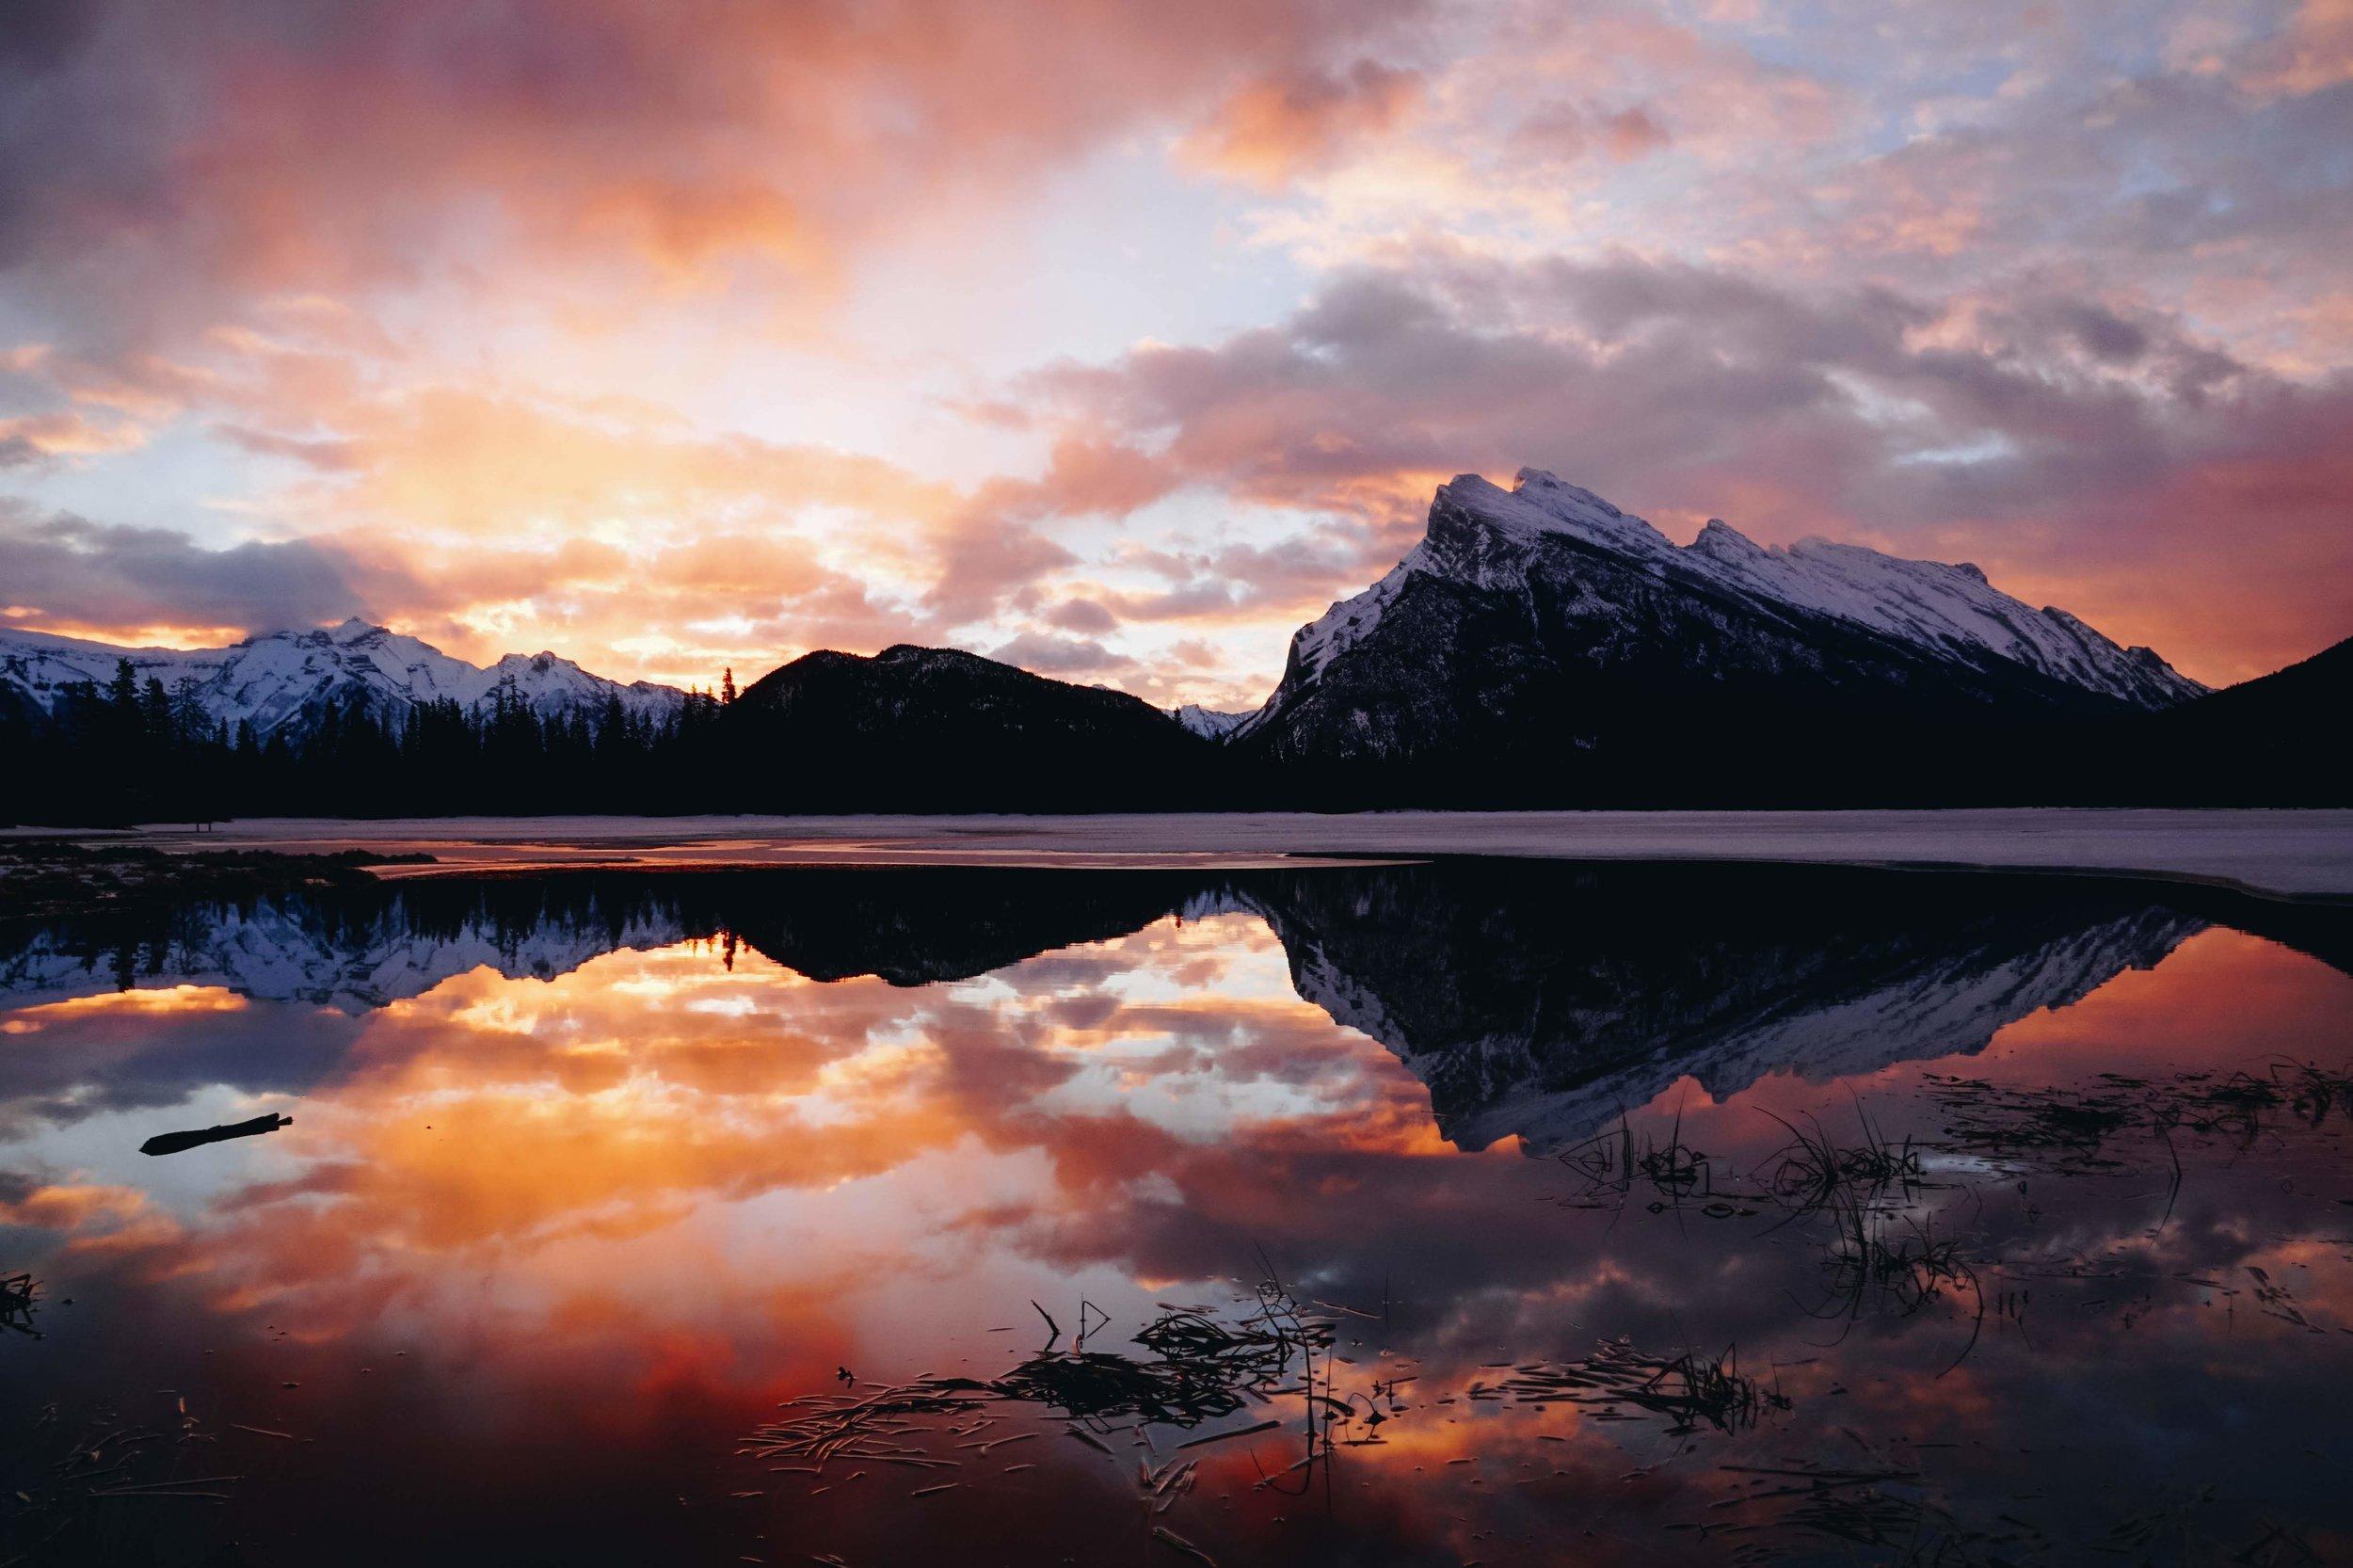 Banff National Park at sunset